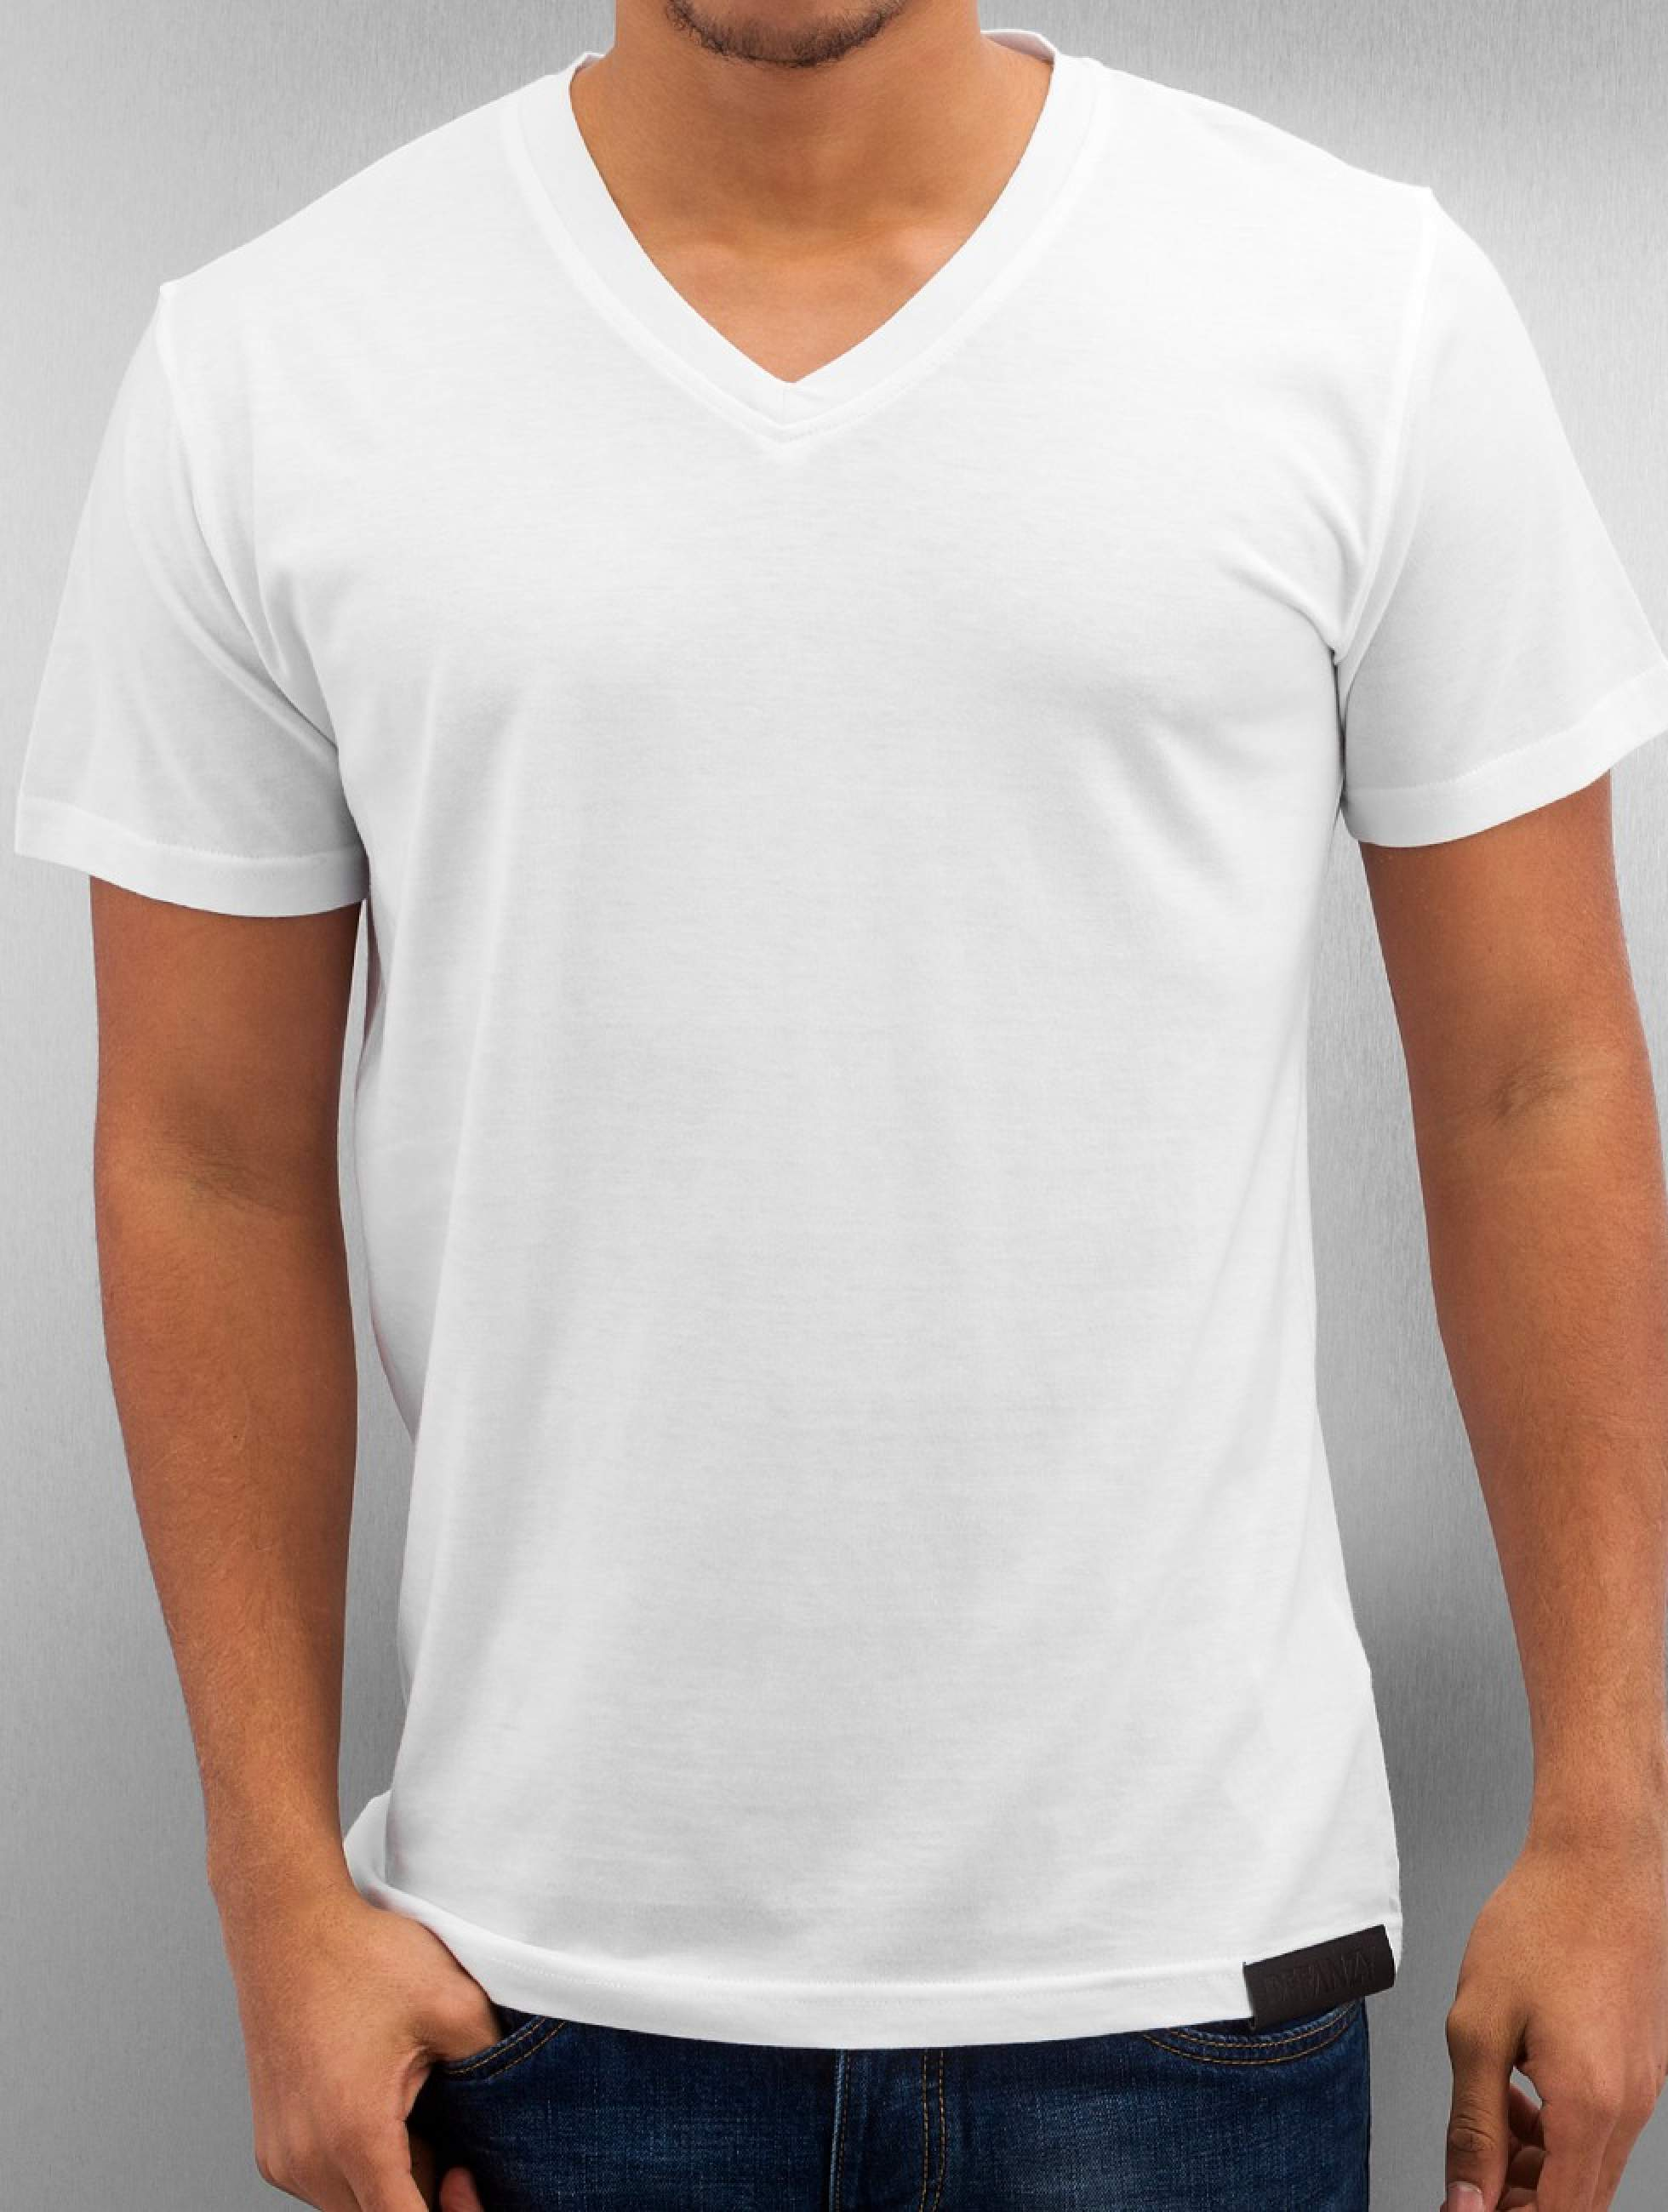 DefShop | Basic V-Neck blanc Homme T-Shirt